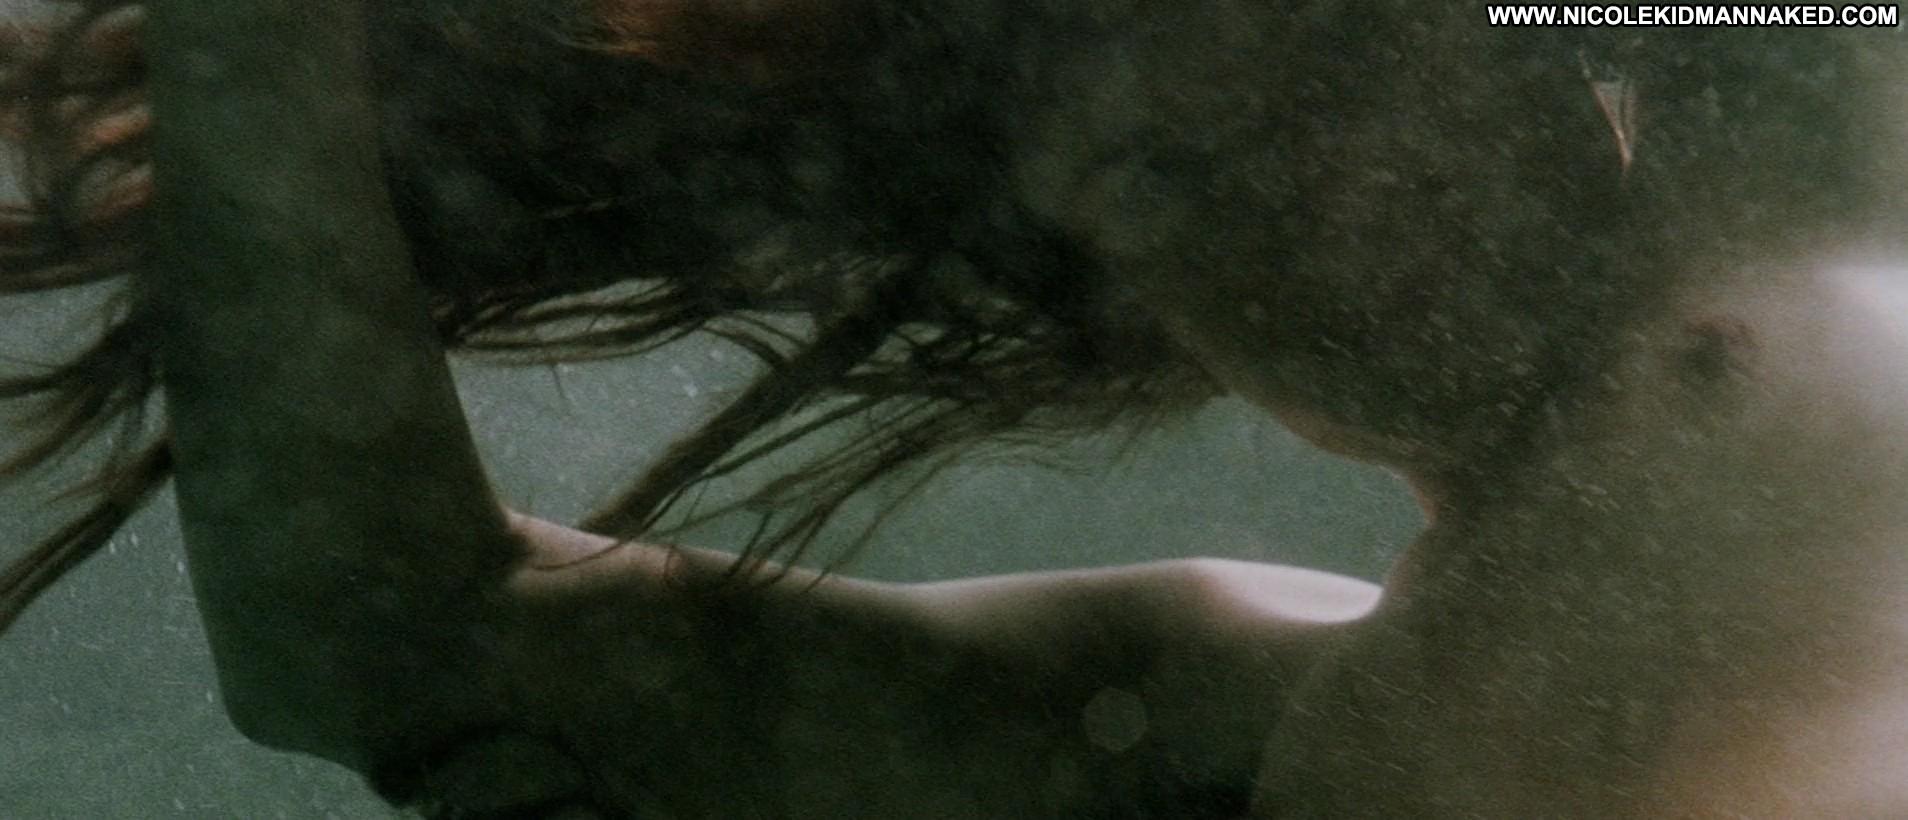 juliette lewis leggs nude